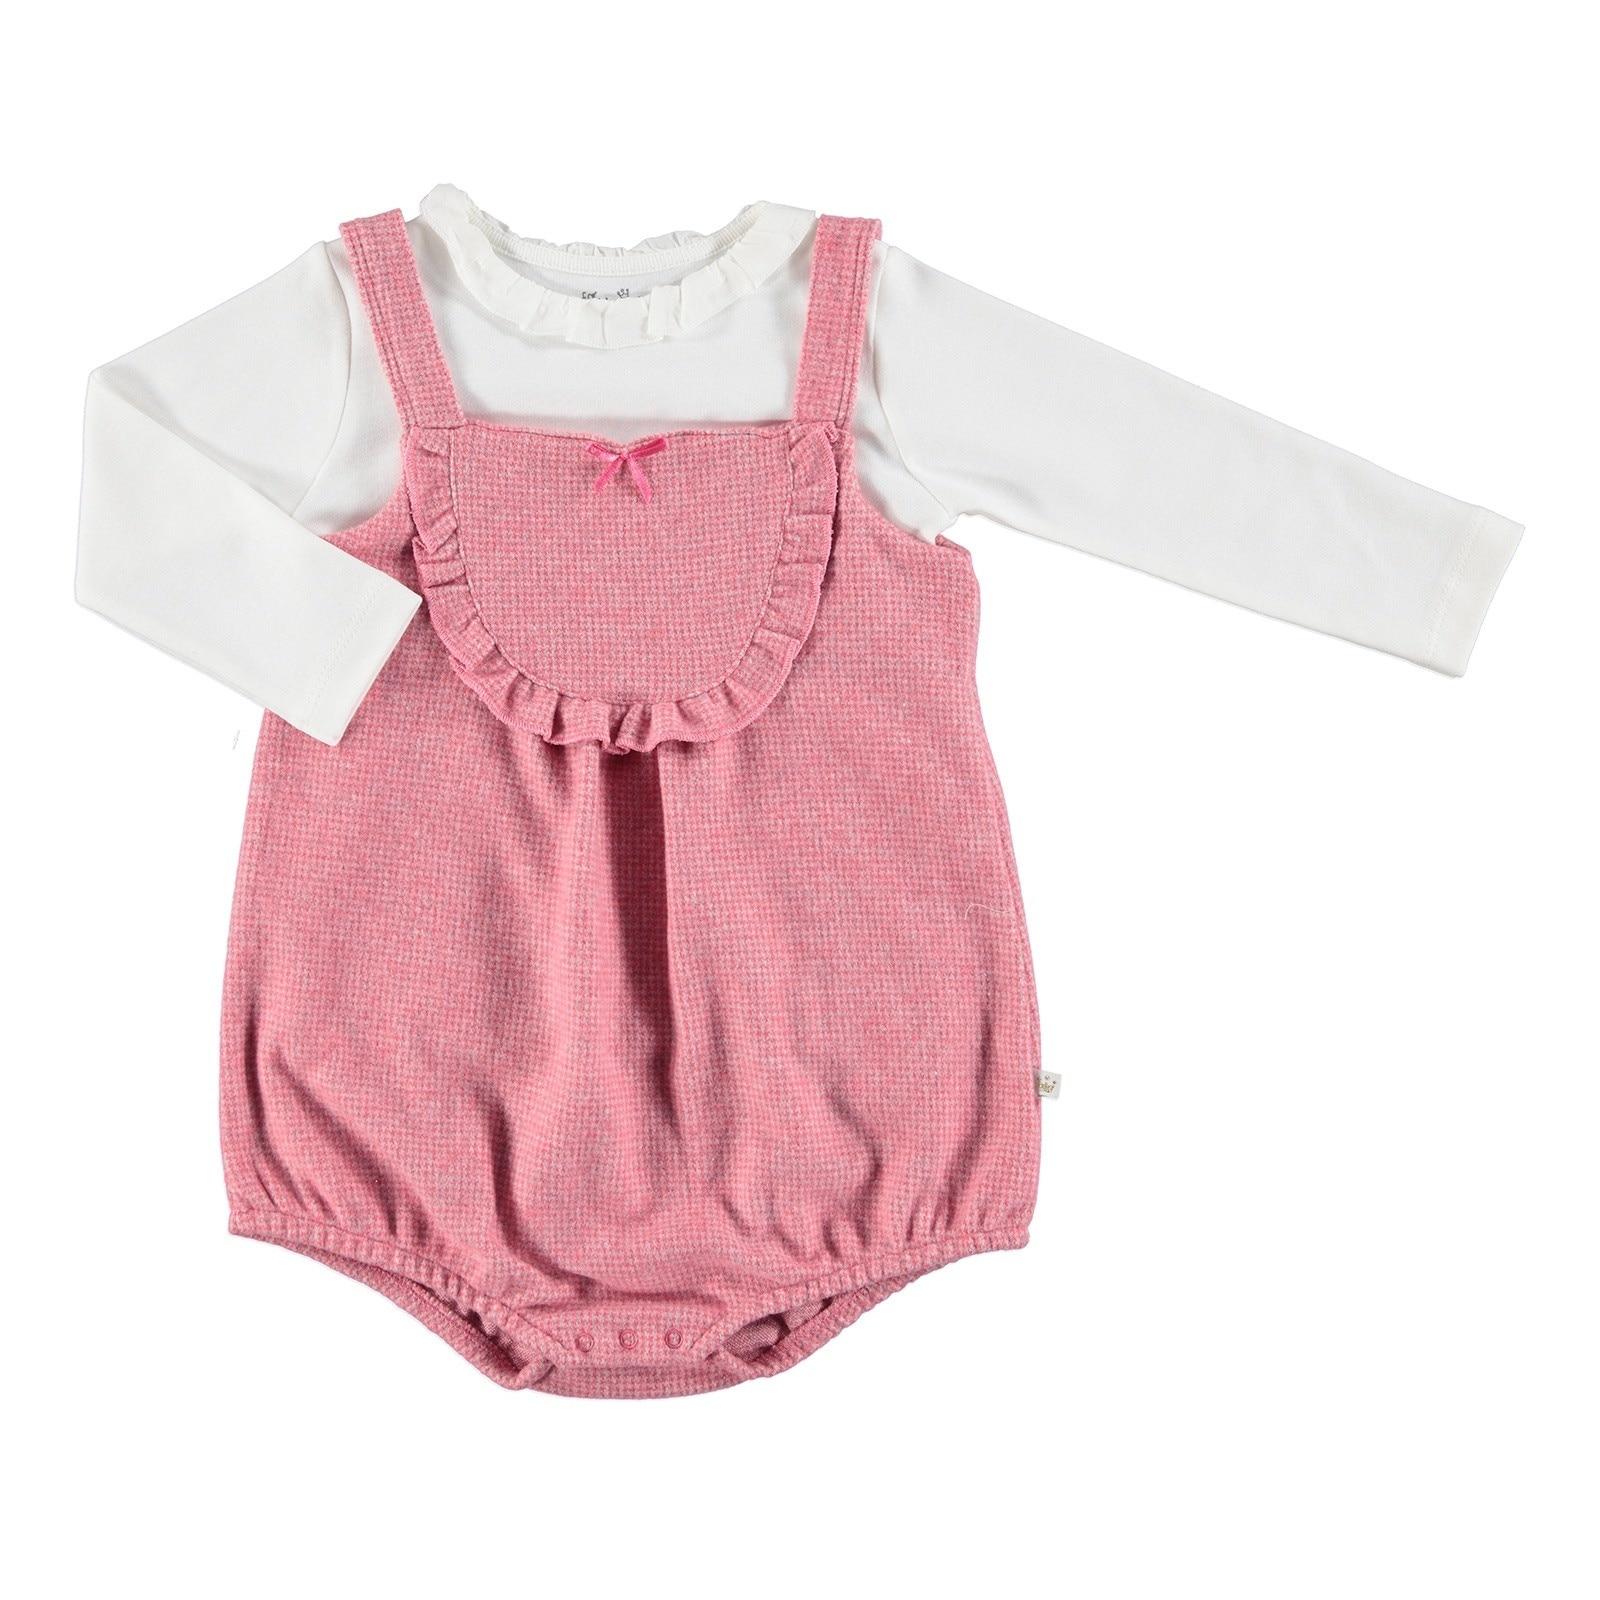 Ebebek For My Baby Bella Ruffled Short Romper Sweatshirt 2 Pcs